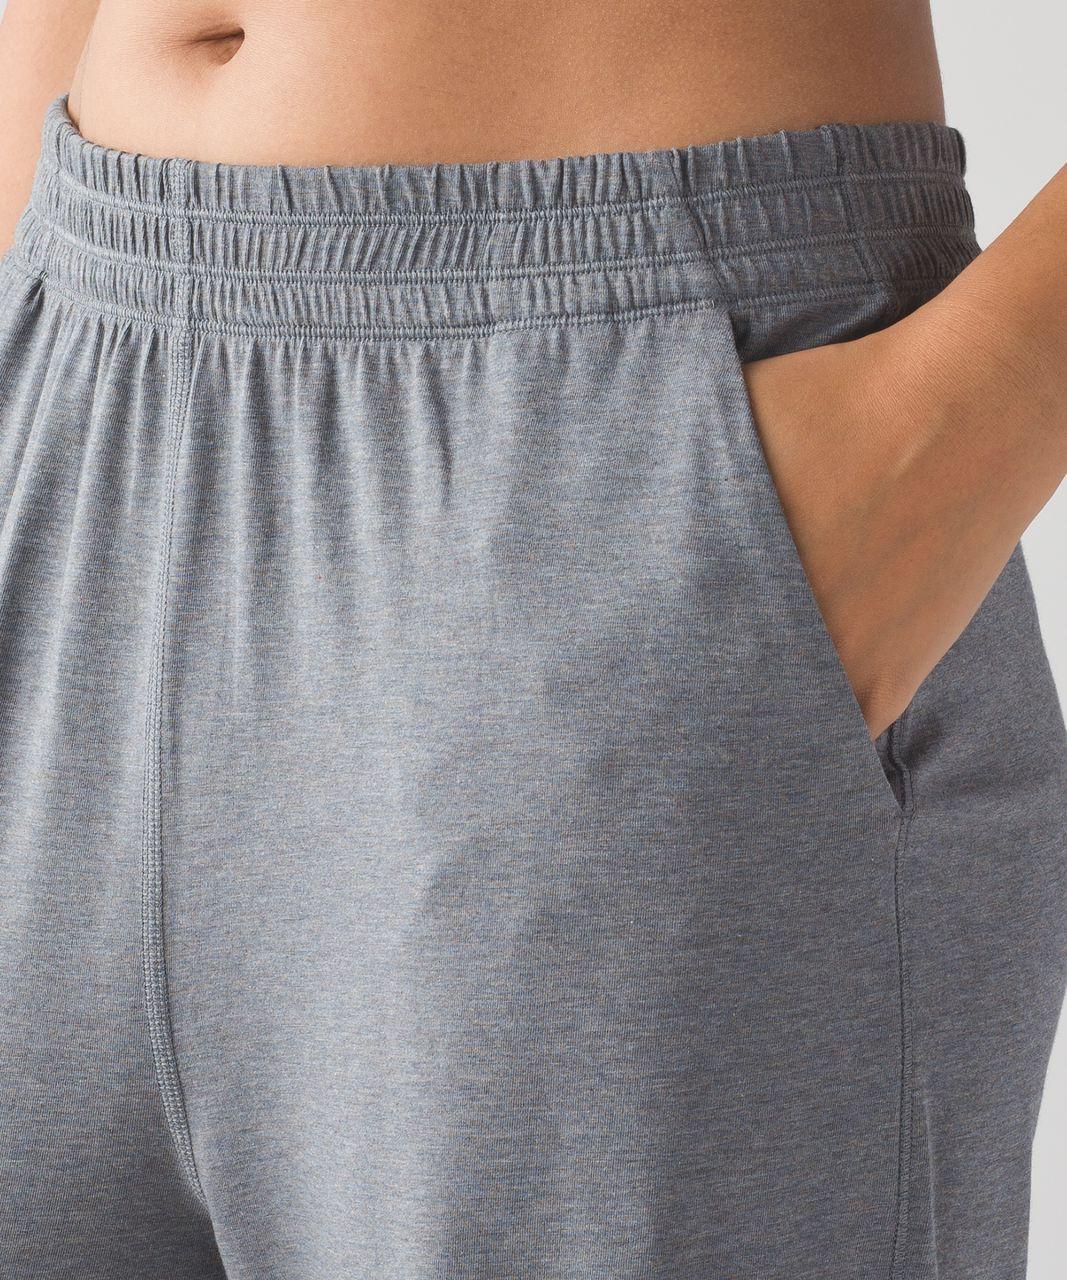 Lululemon Rite Time Pant - Heathered Arctic Grey